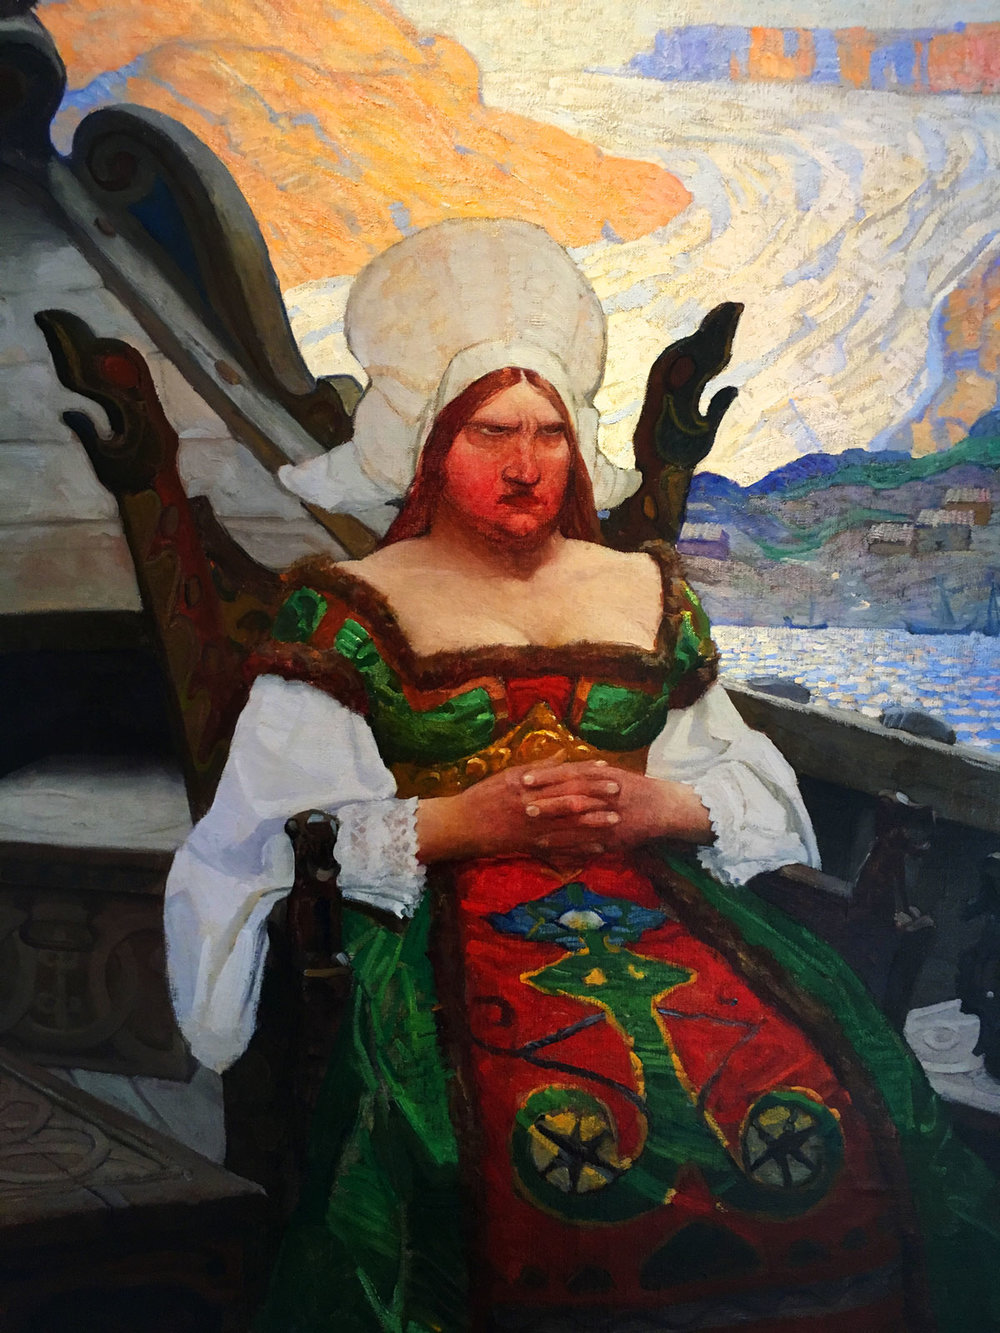 Viking Princess - I think by Wyeth